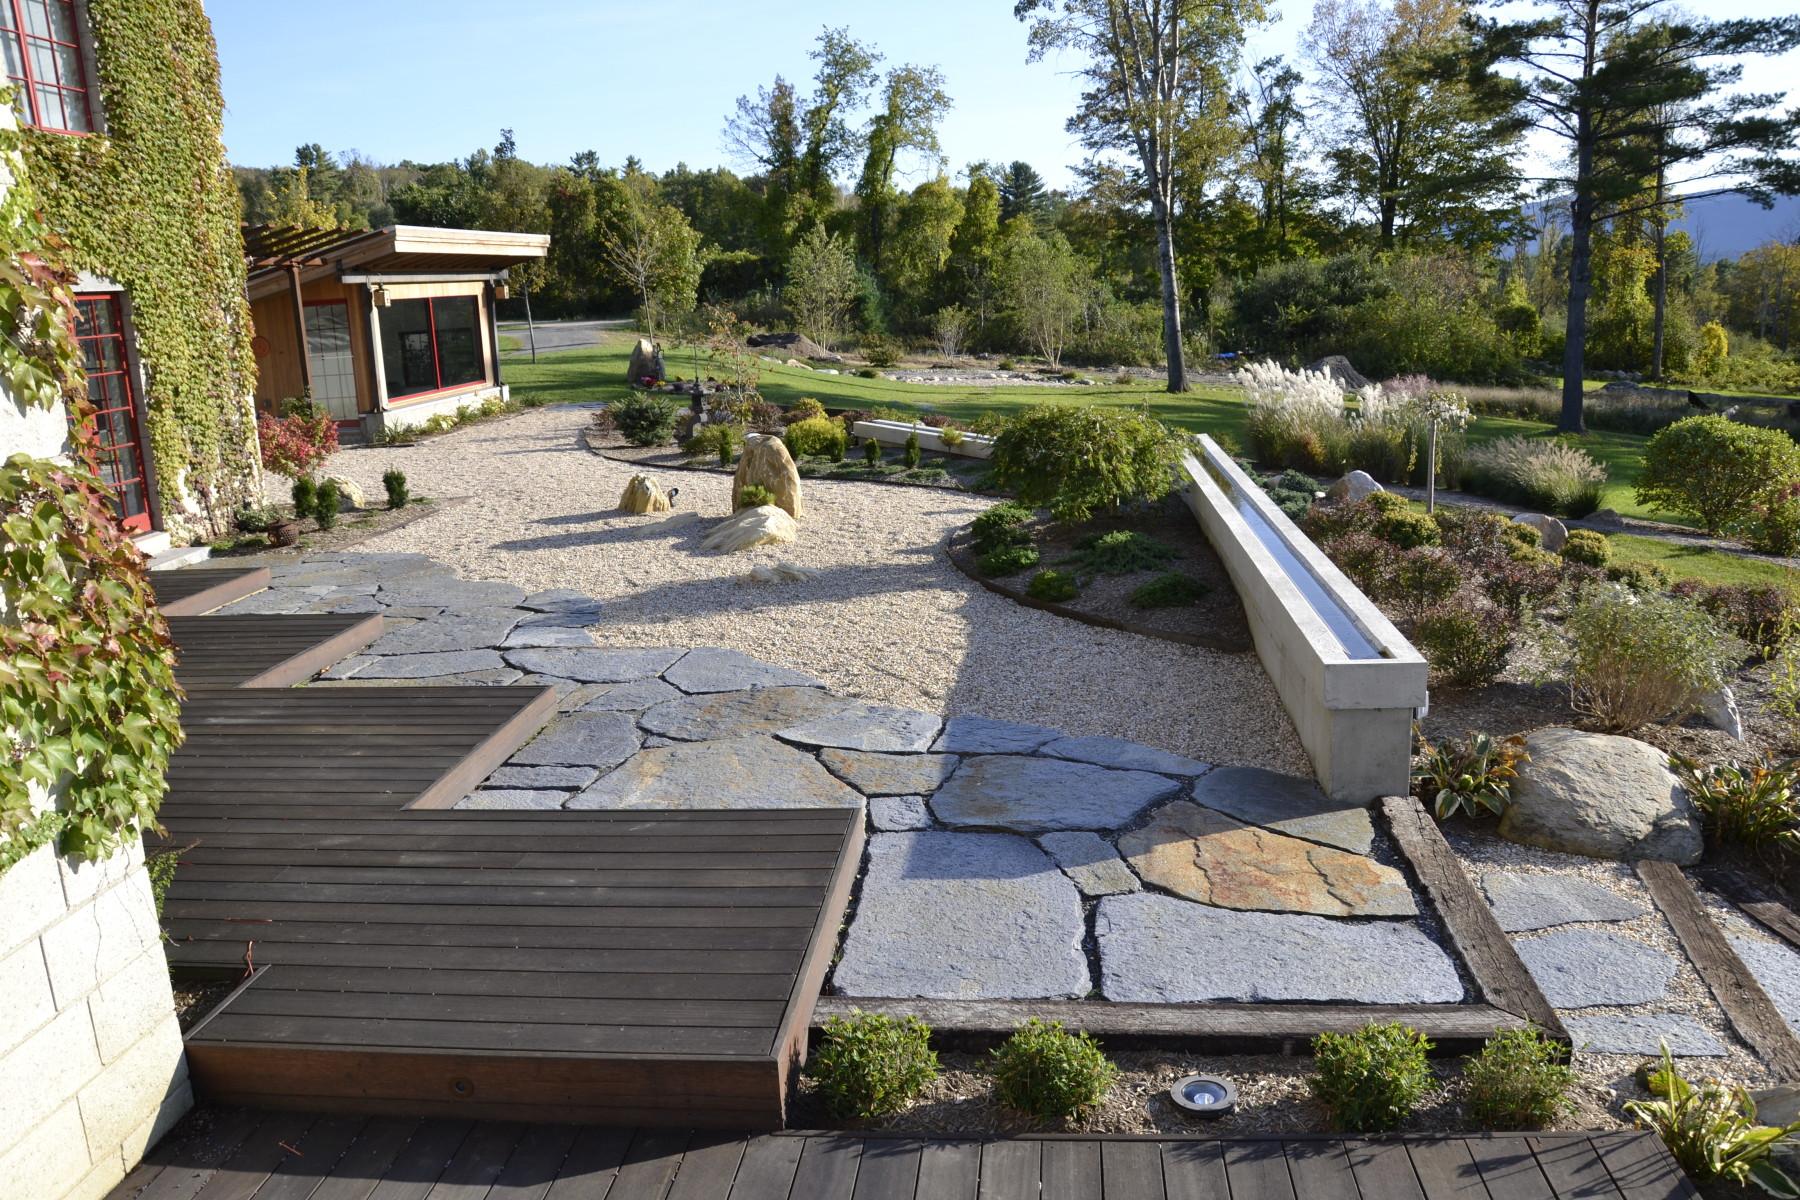 Berkshire Asian water weir, scalene triangulated water boulders, Goshen Stone terrace, Teak deck, 'Dwarf Woodlands'